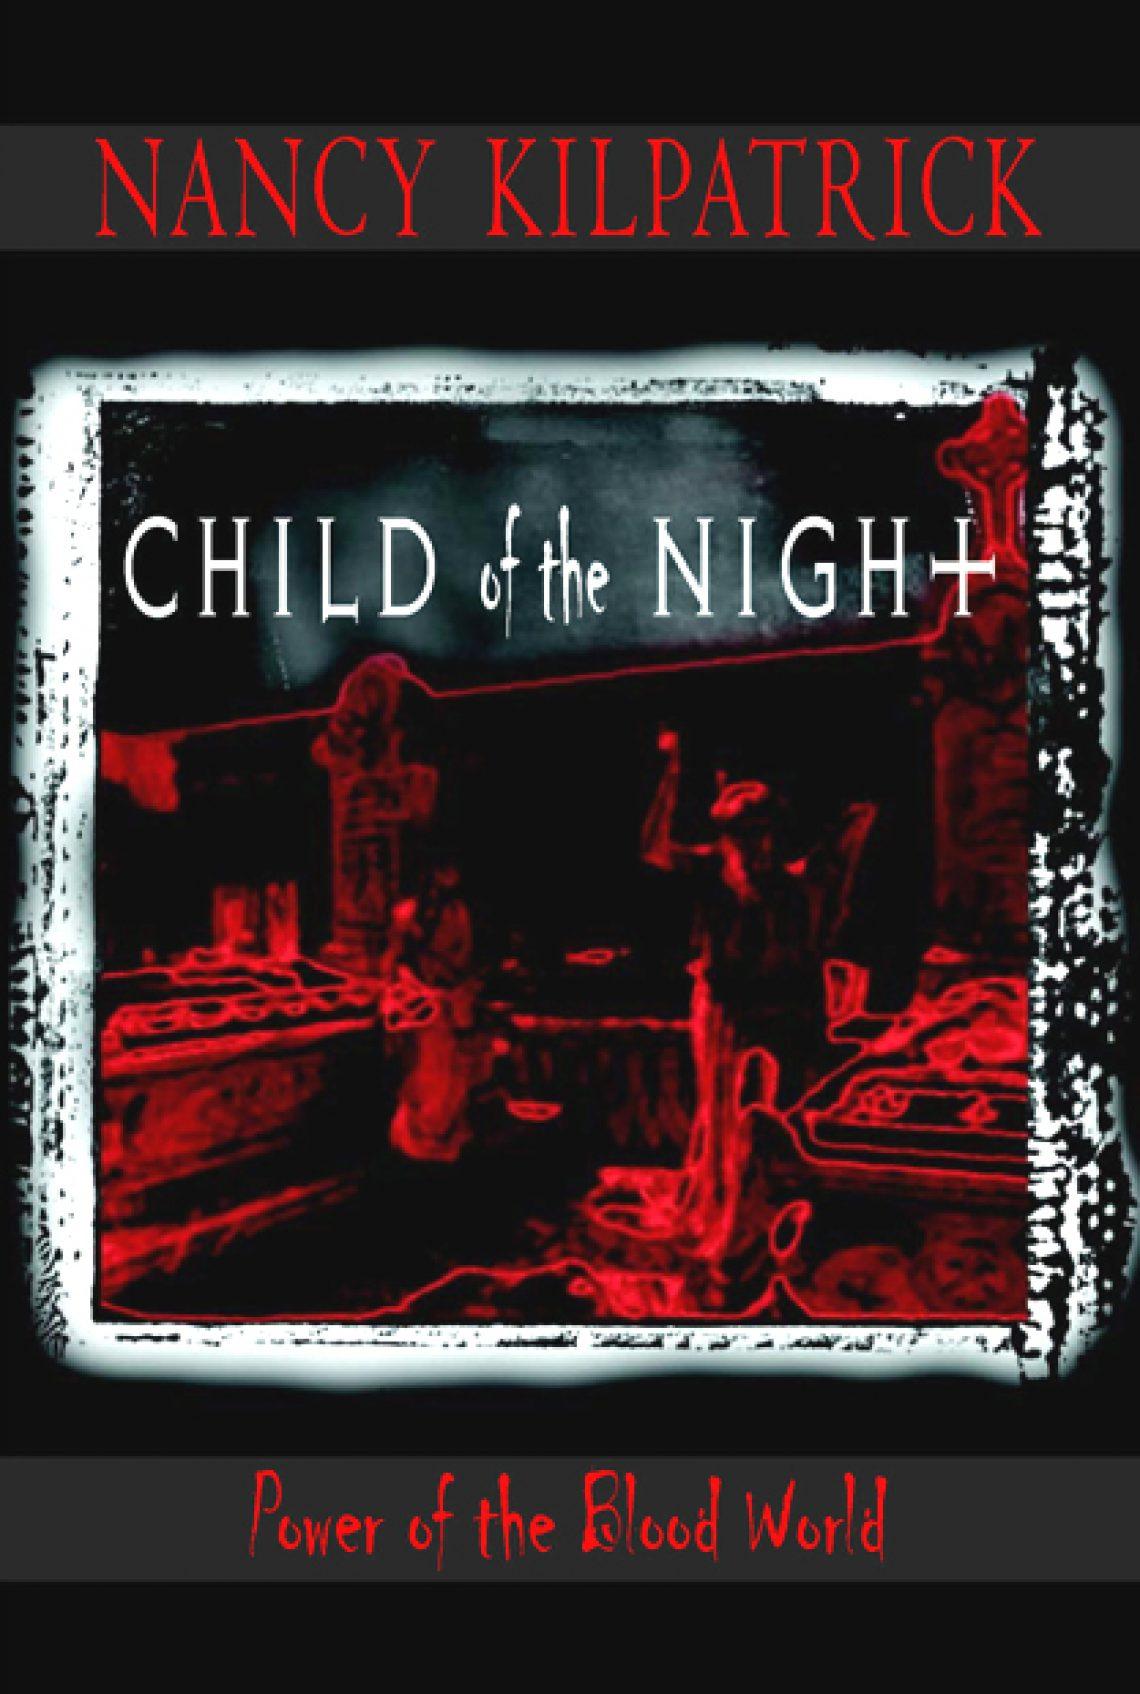 ChildoftheNightCover